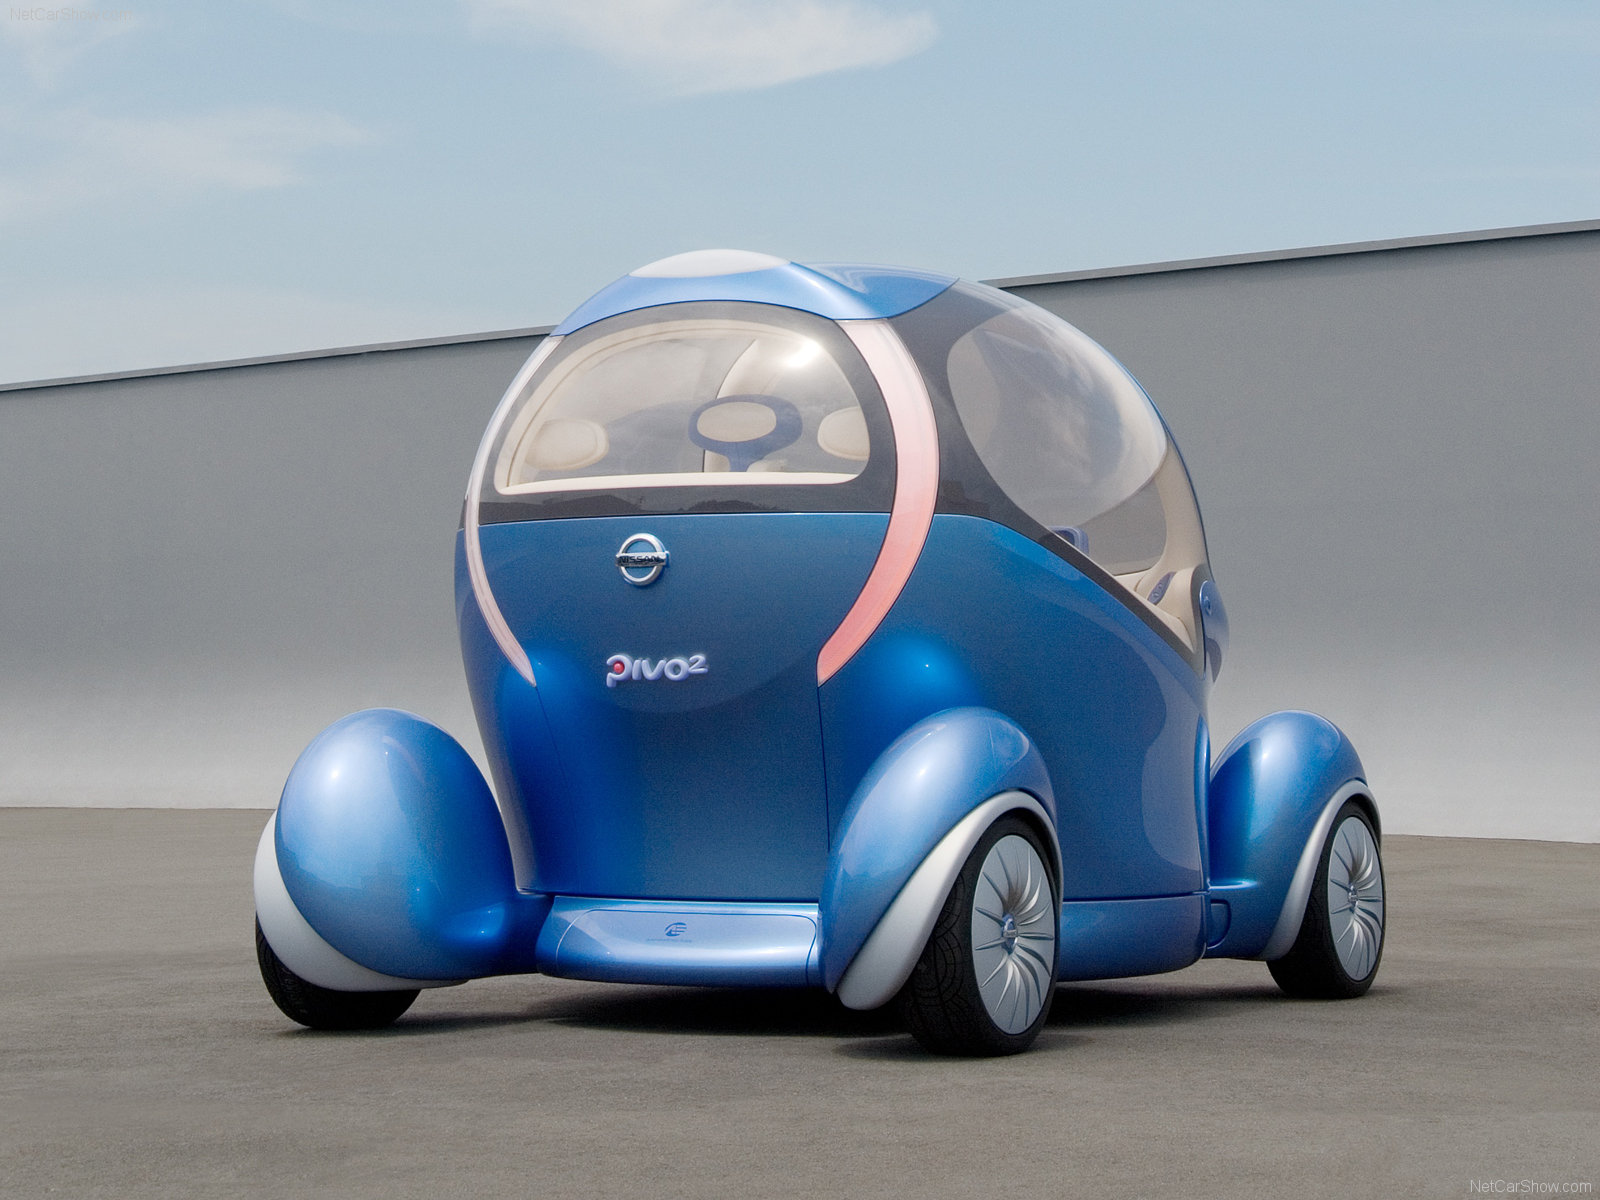 Nissan Pivo 3 Concept - Tokyo Auto Show - Autotrader